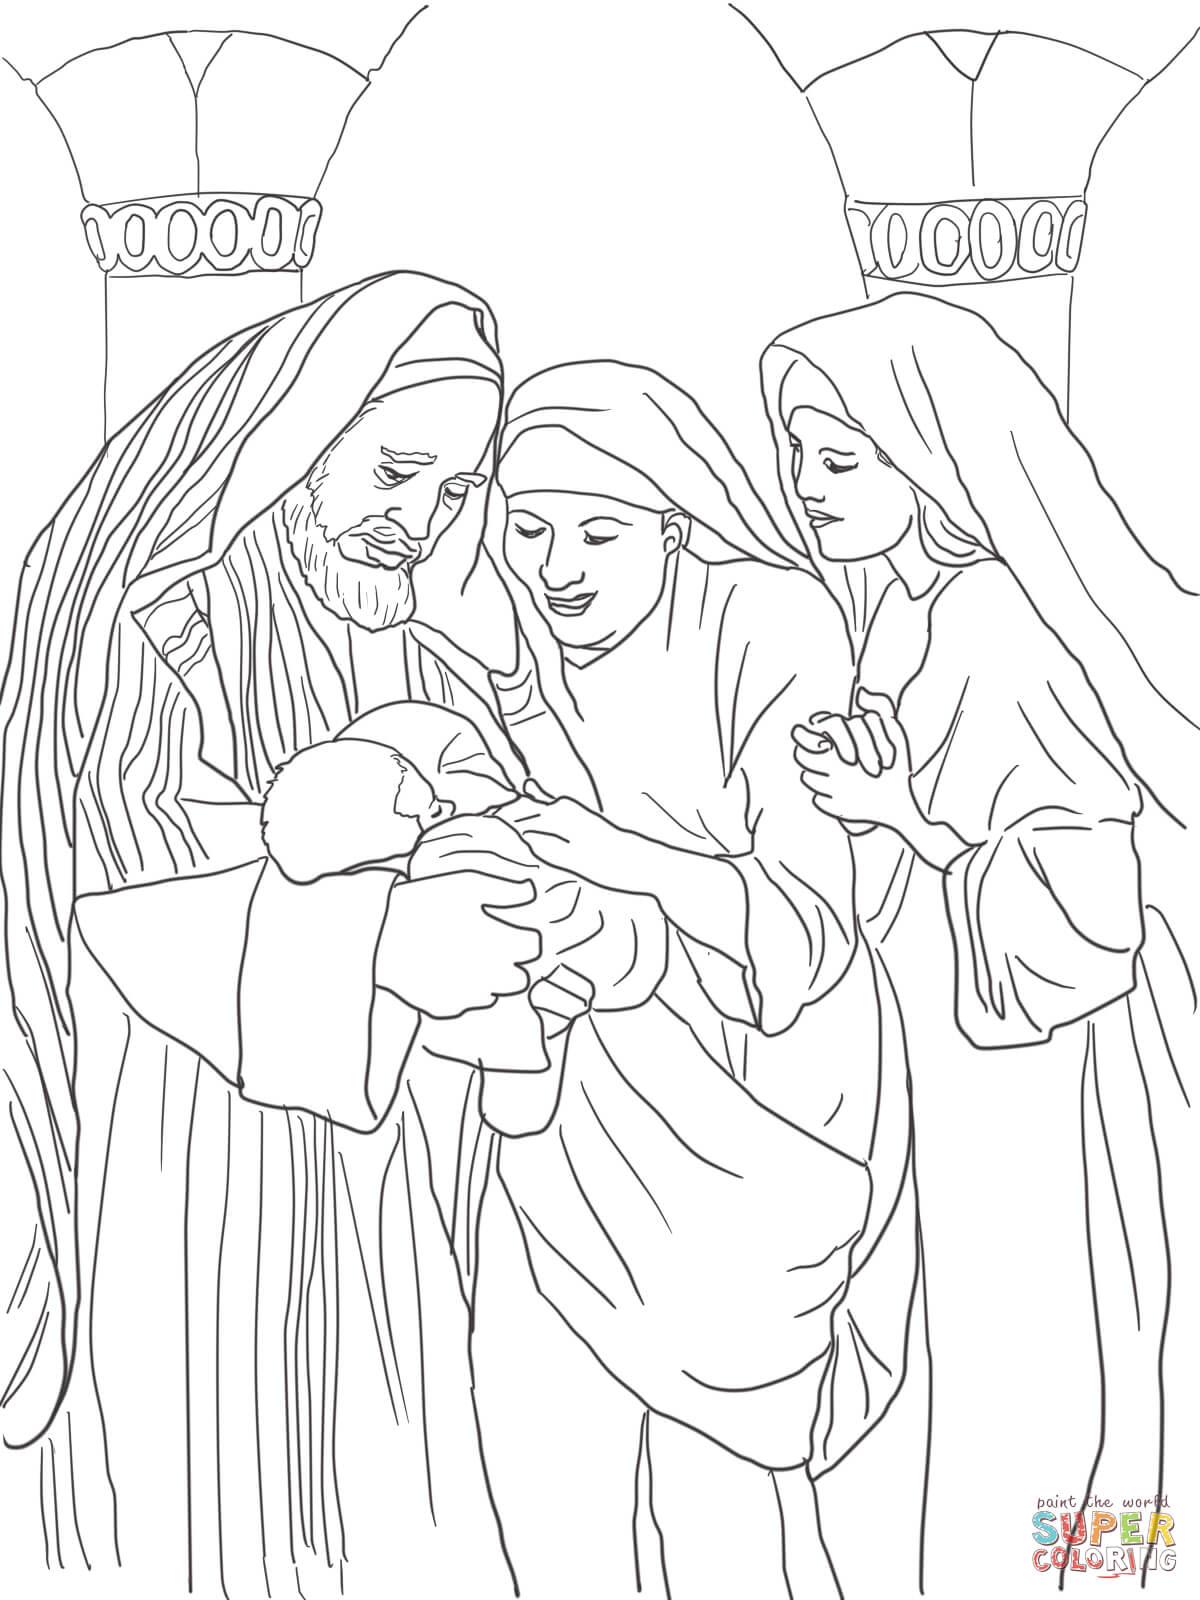 Zechariah, Elizabeth and Baby John the Baptist coloring